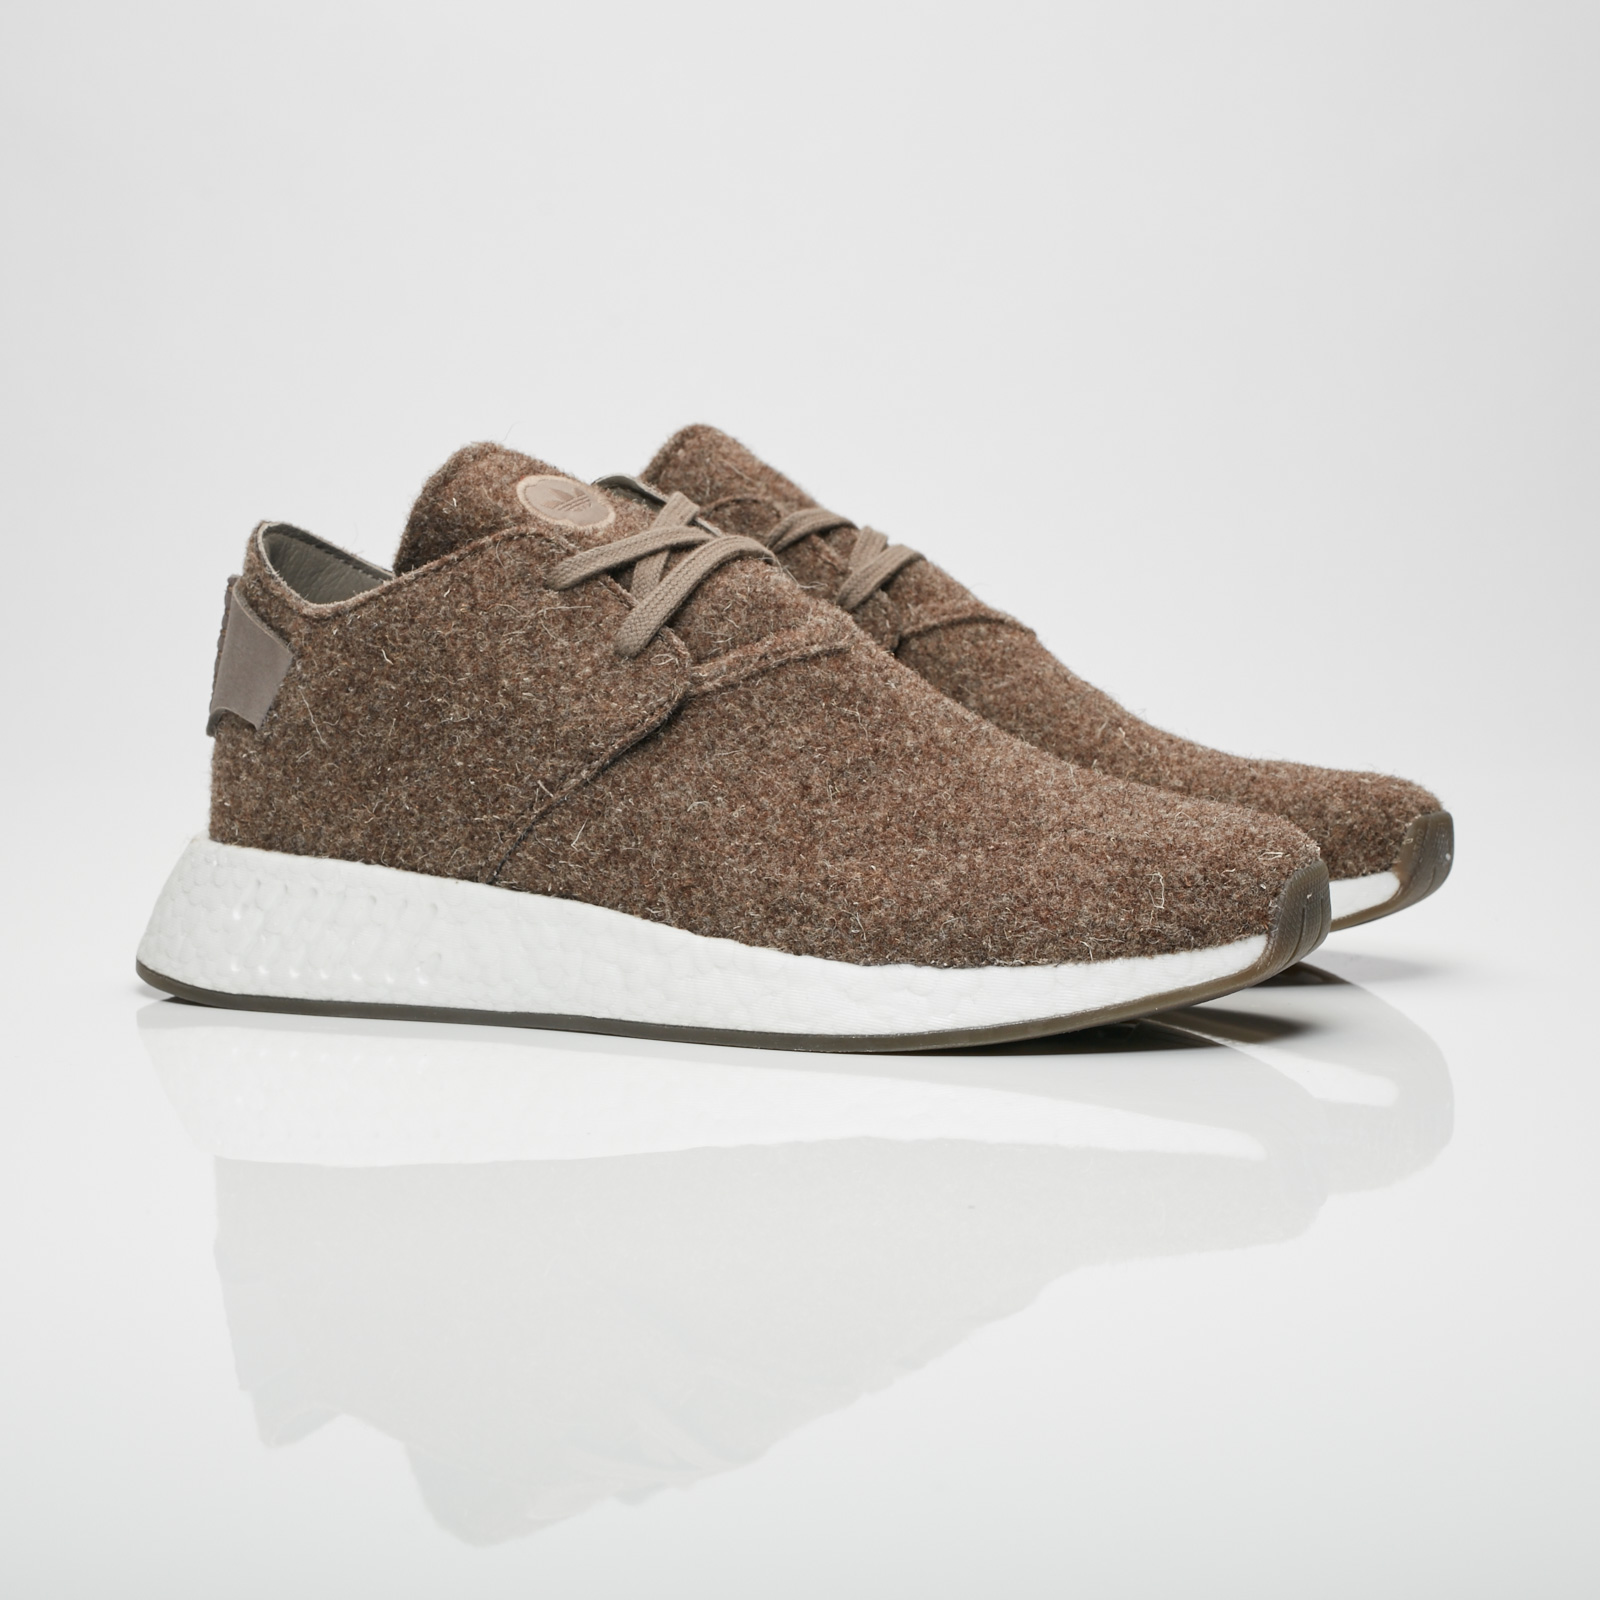 7a534bedb adidas NMD C2 - Cg3781 - Sneakersnstuff